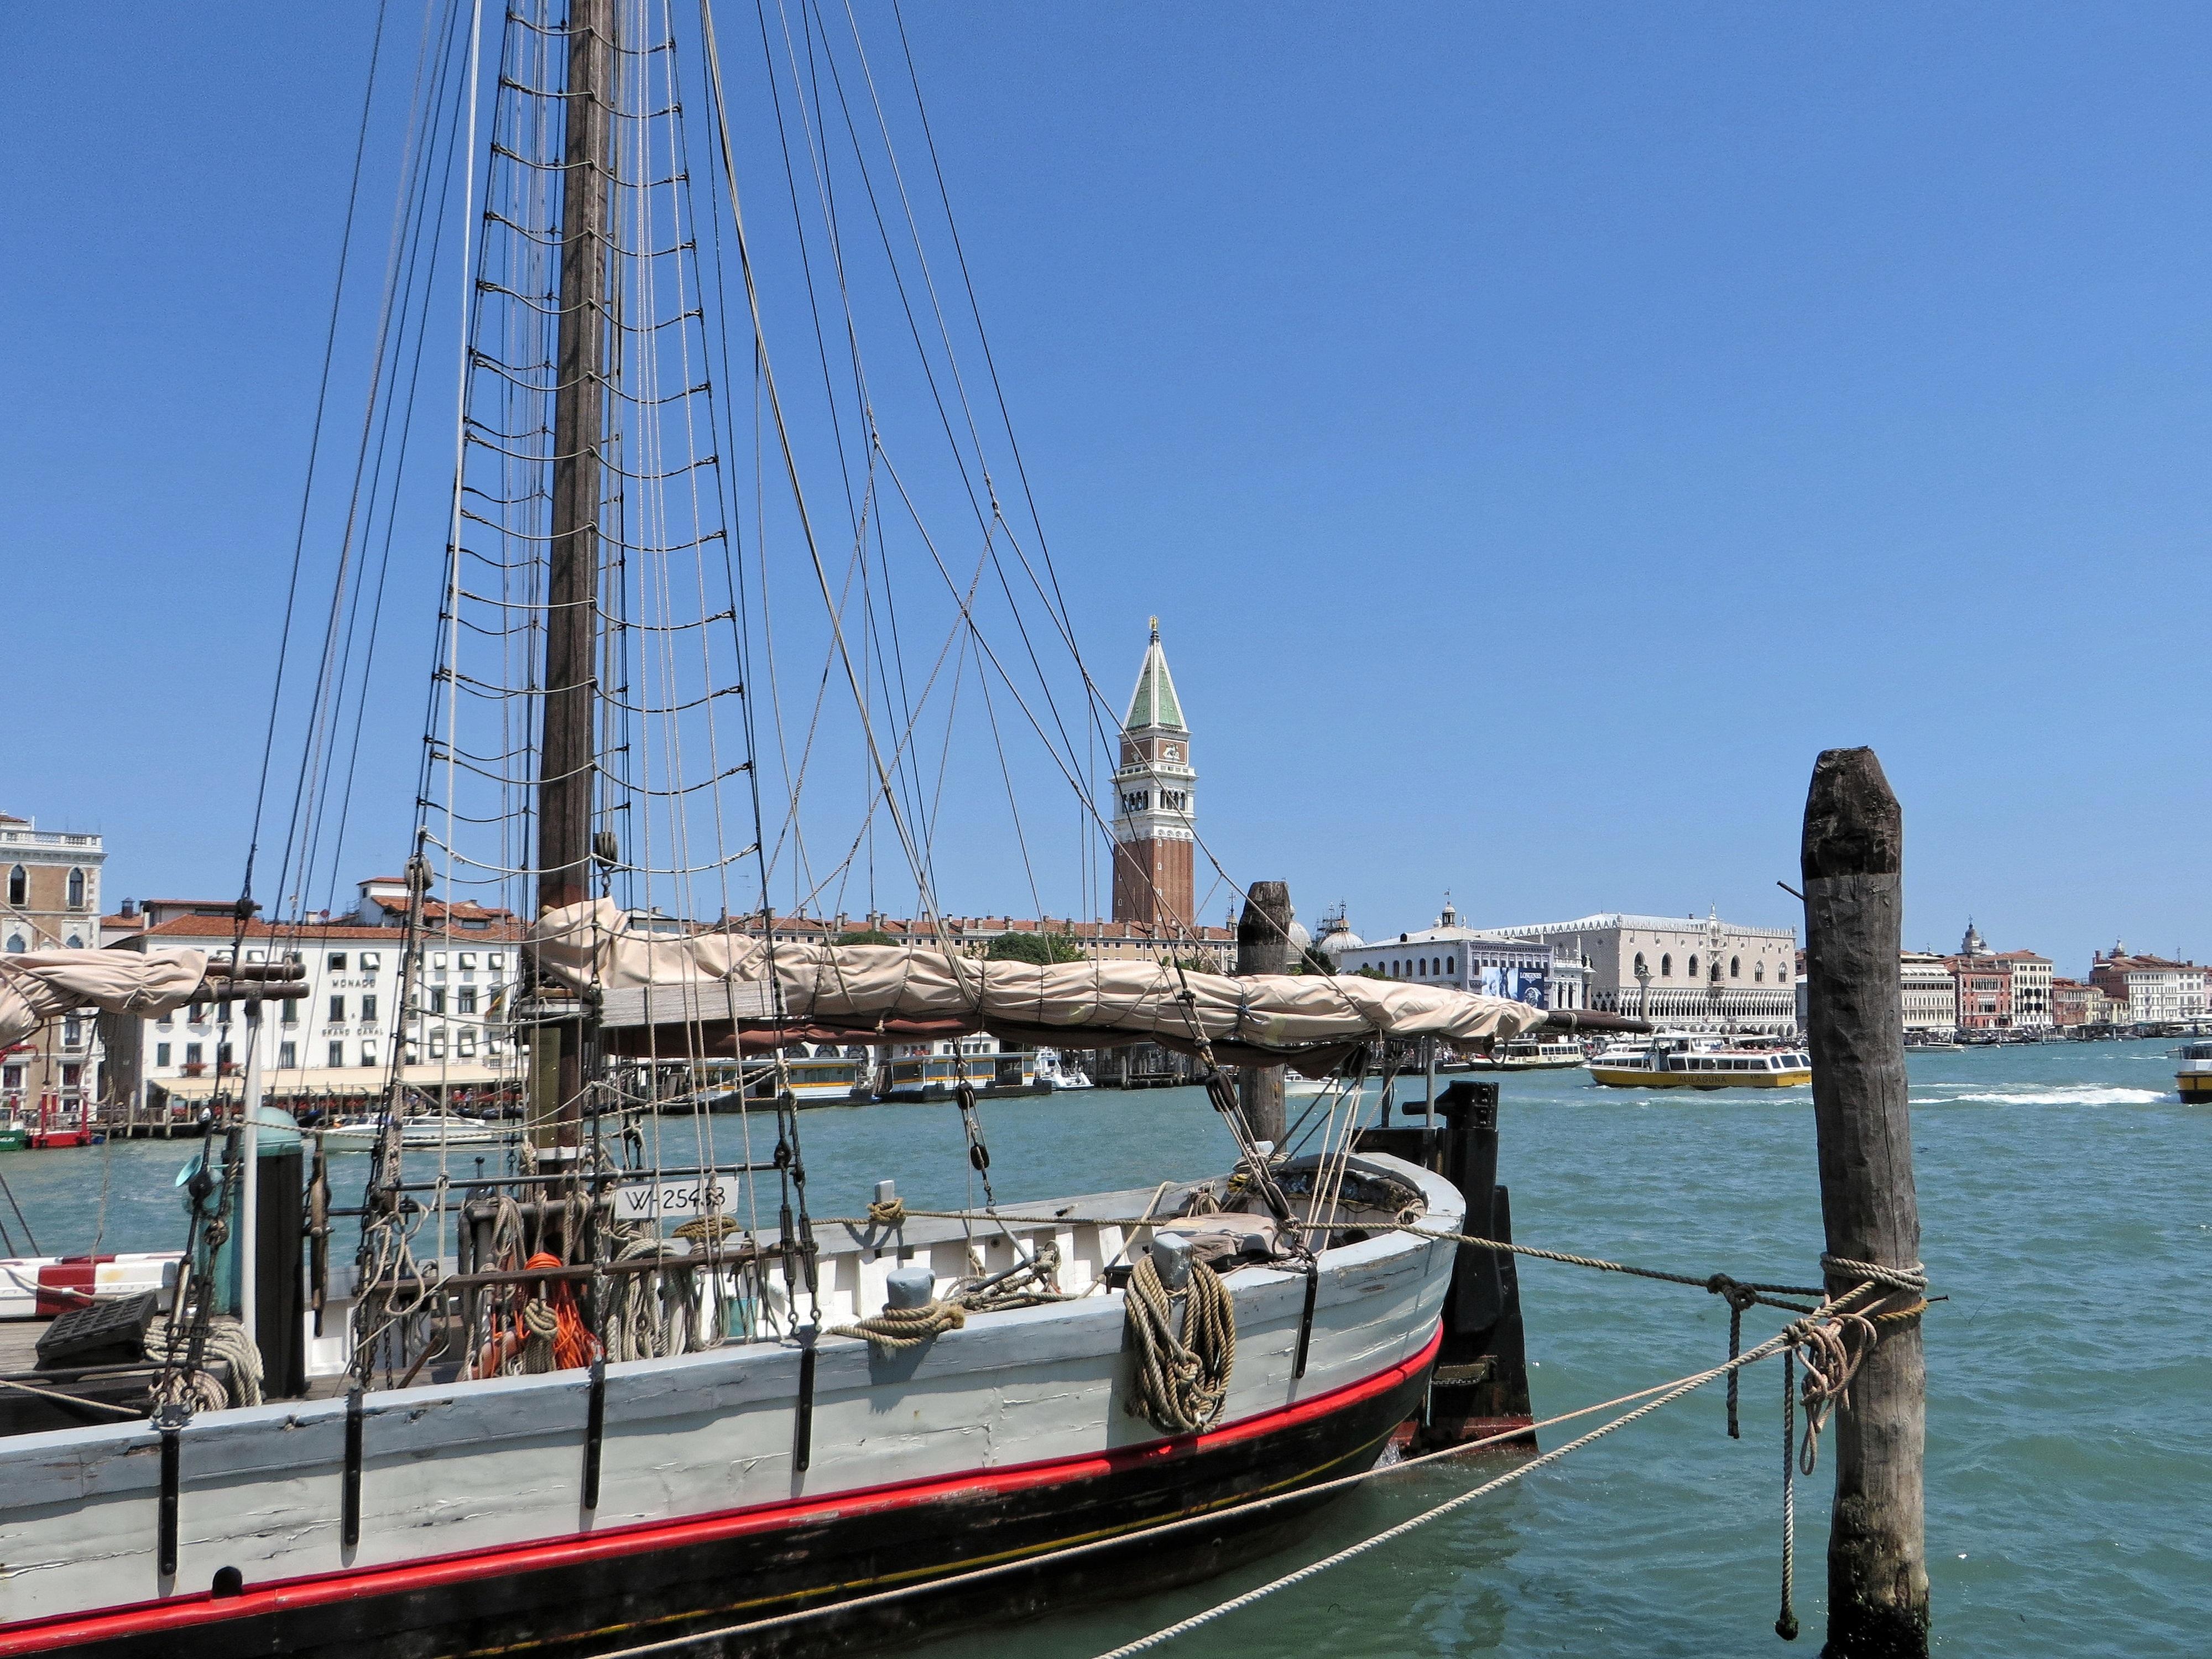 images gratuites mer dock pont palais ville m t italie port venise marina port. Black Bedroom Furniture Sets. Home Design Ideas